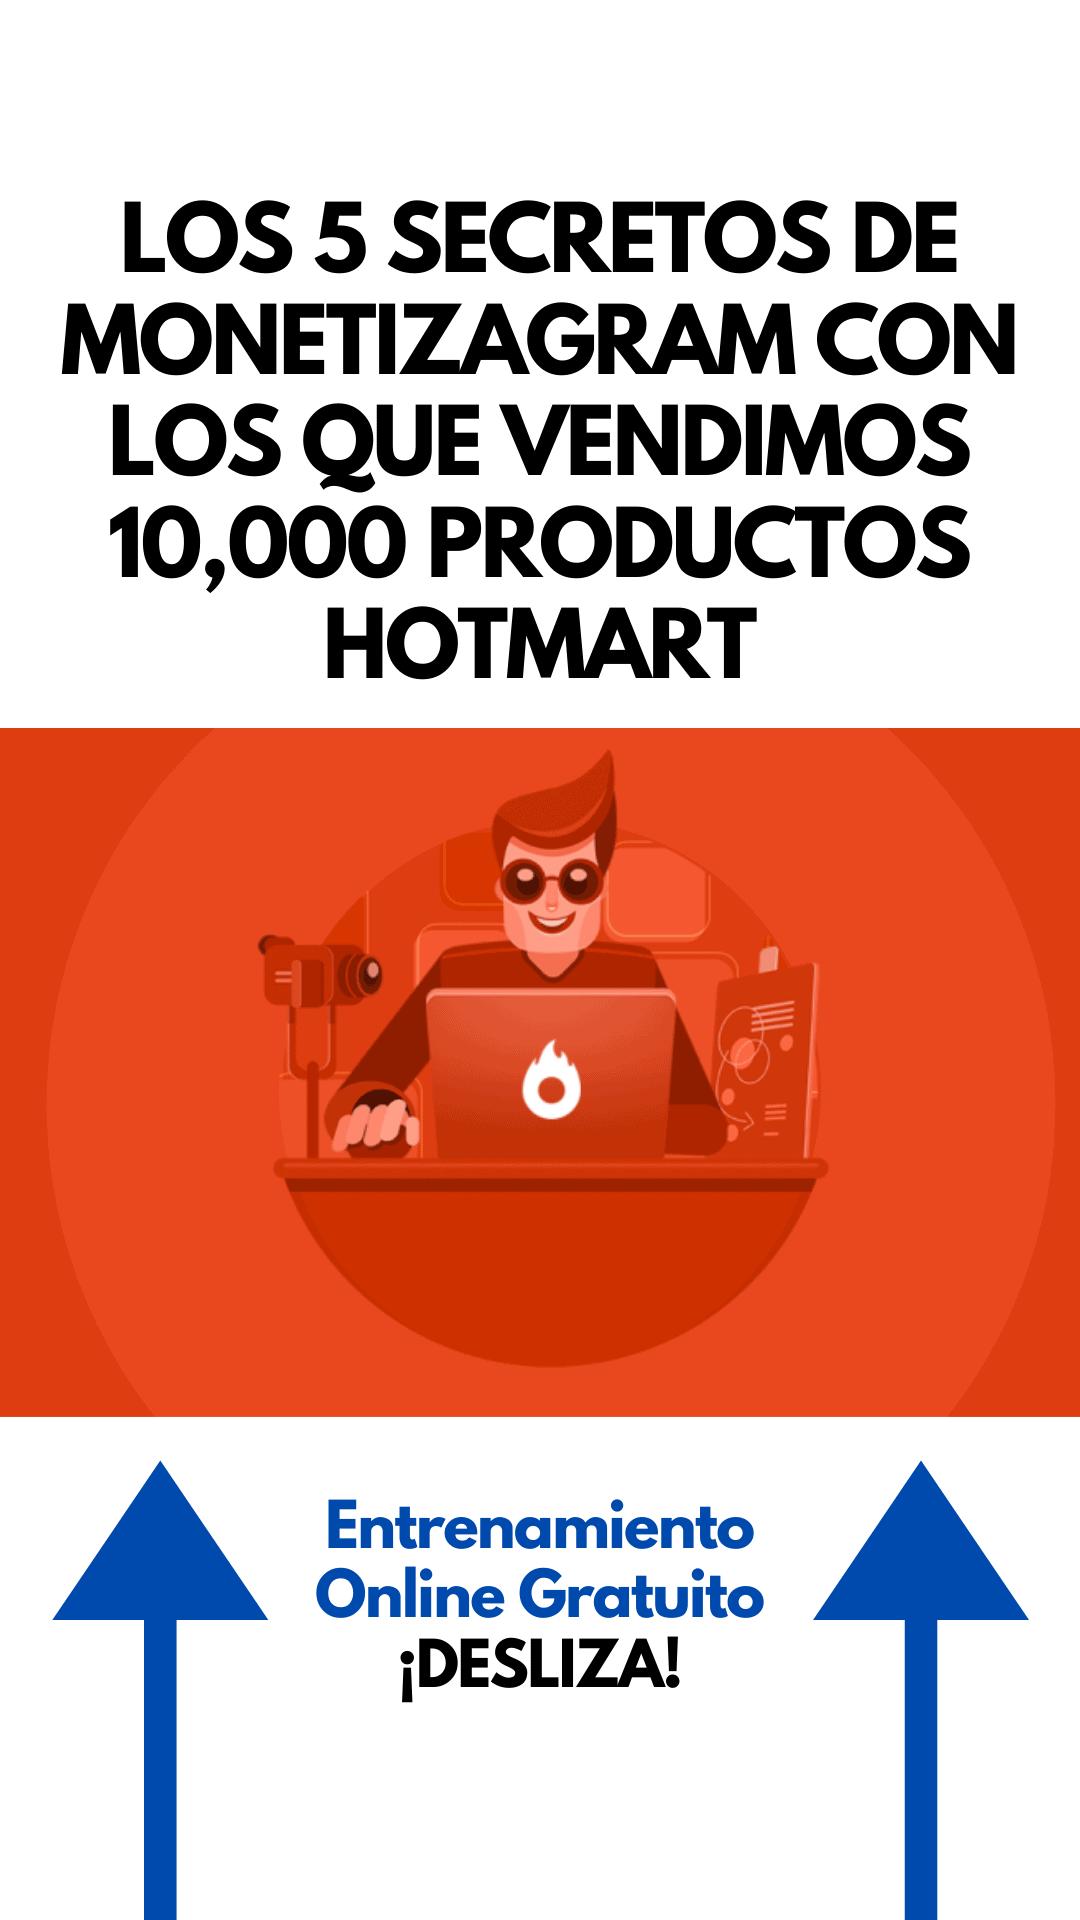 Monetizagram Hotmart